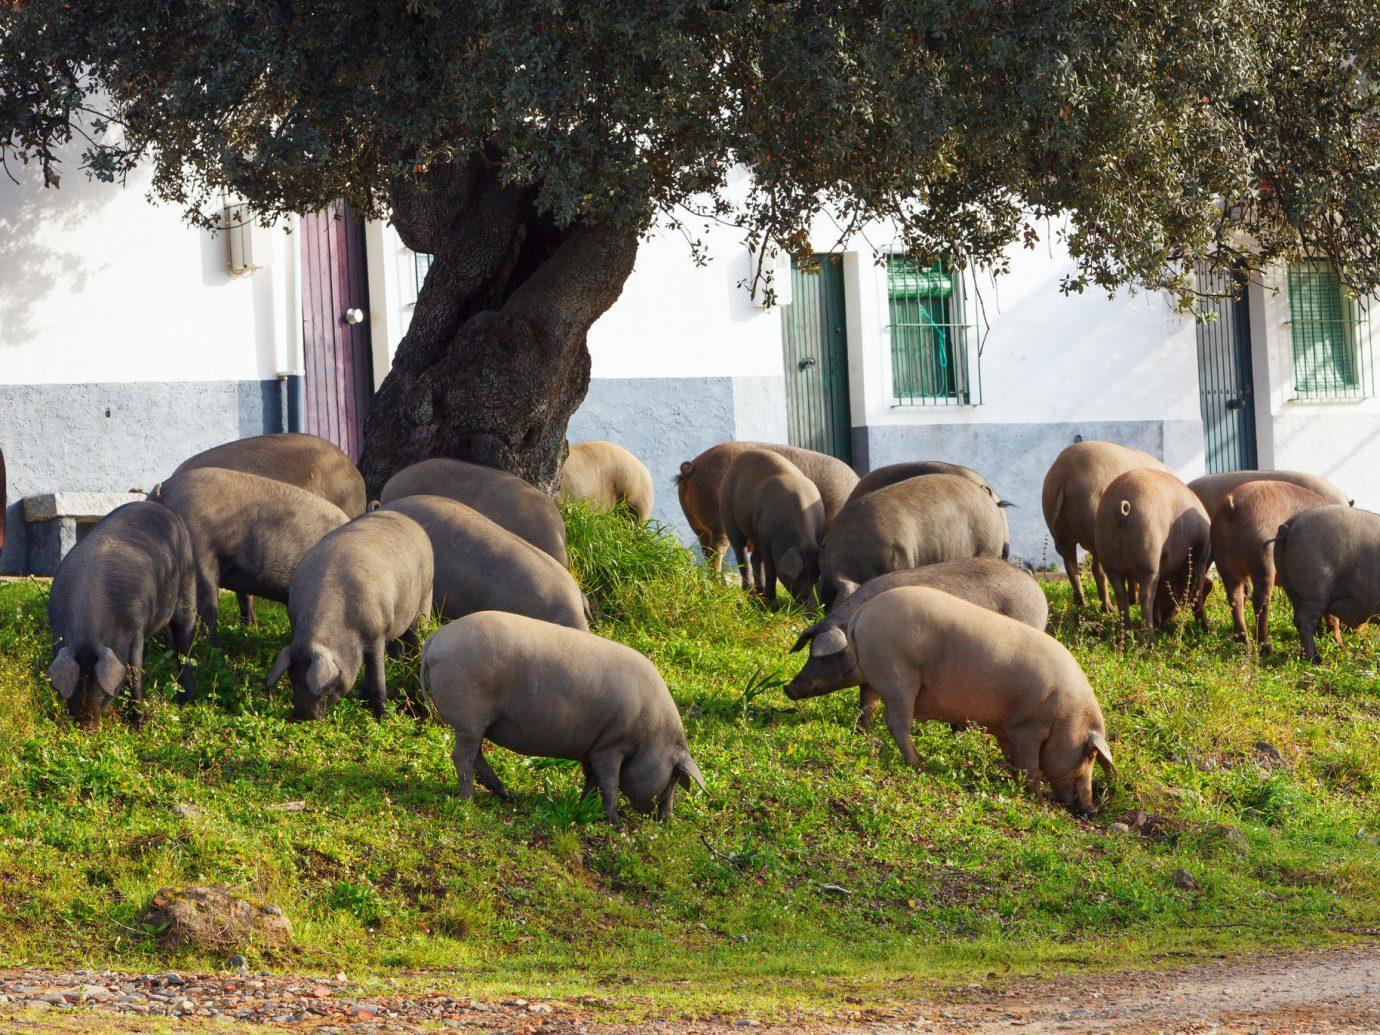 Road Trips Trip Ideas tree grass outdoor mammal fauna Wildlife herd grazing elephant Farm elephants and mammoths group